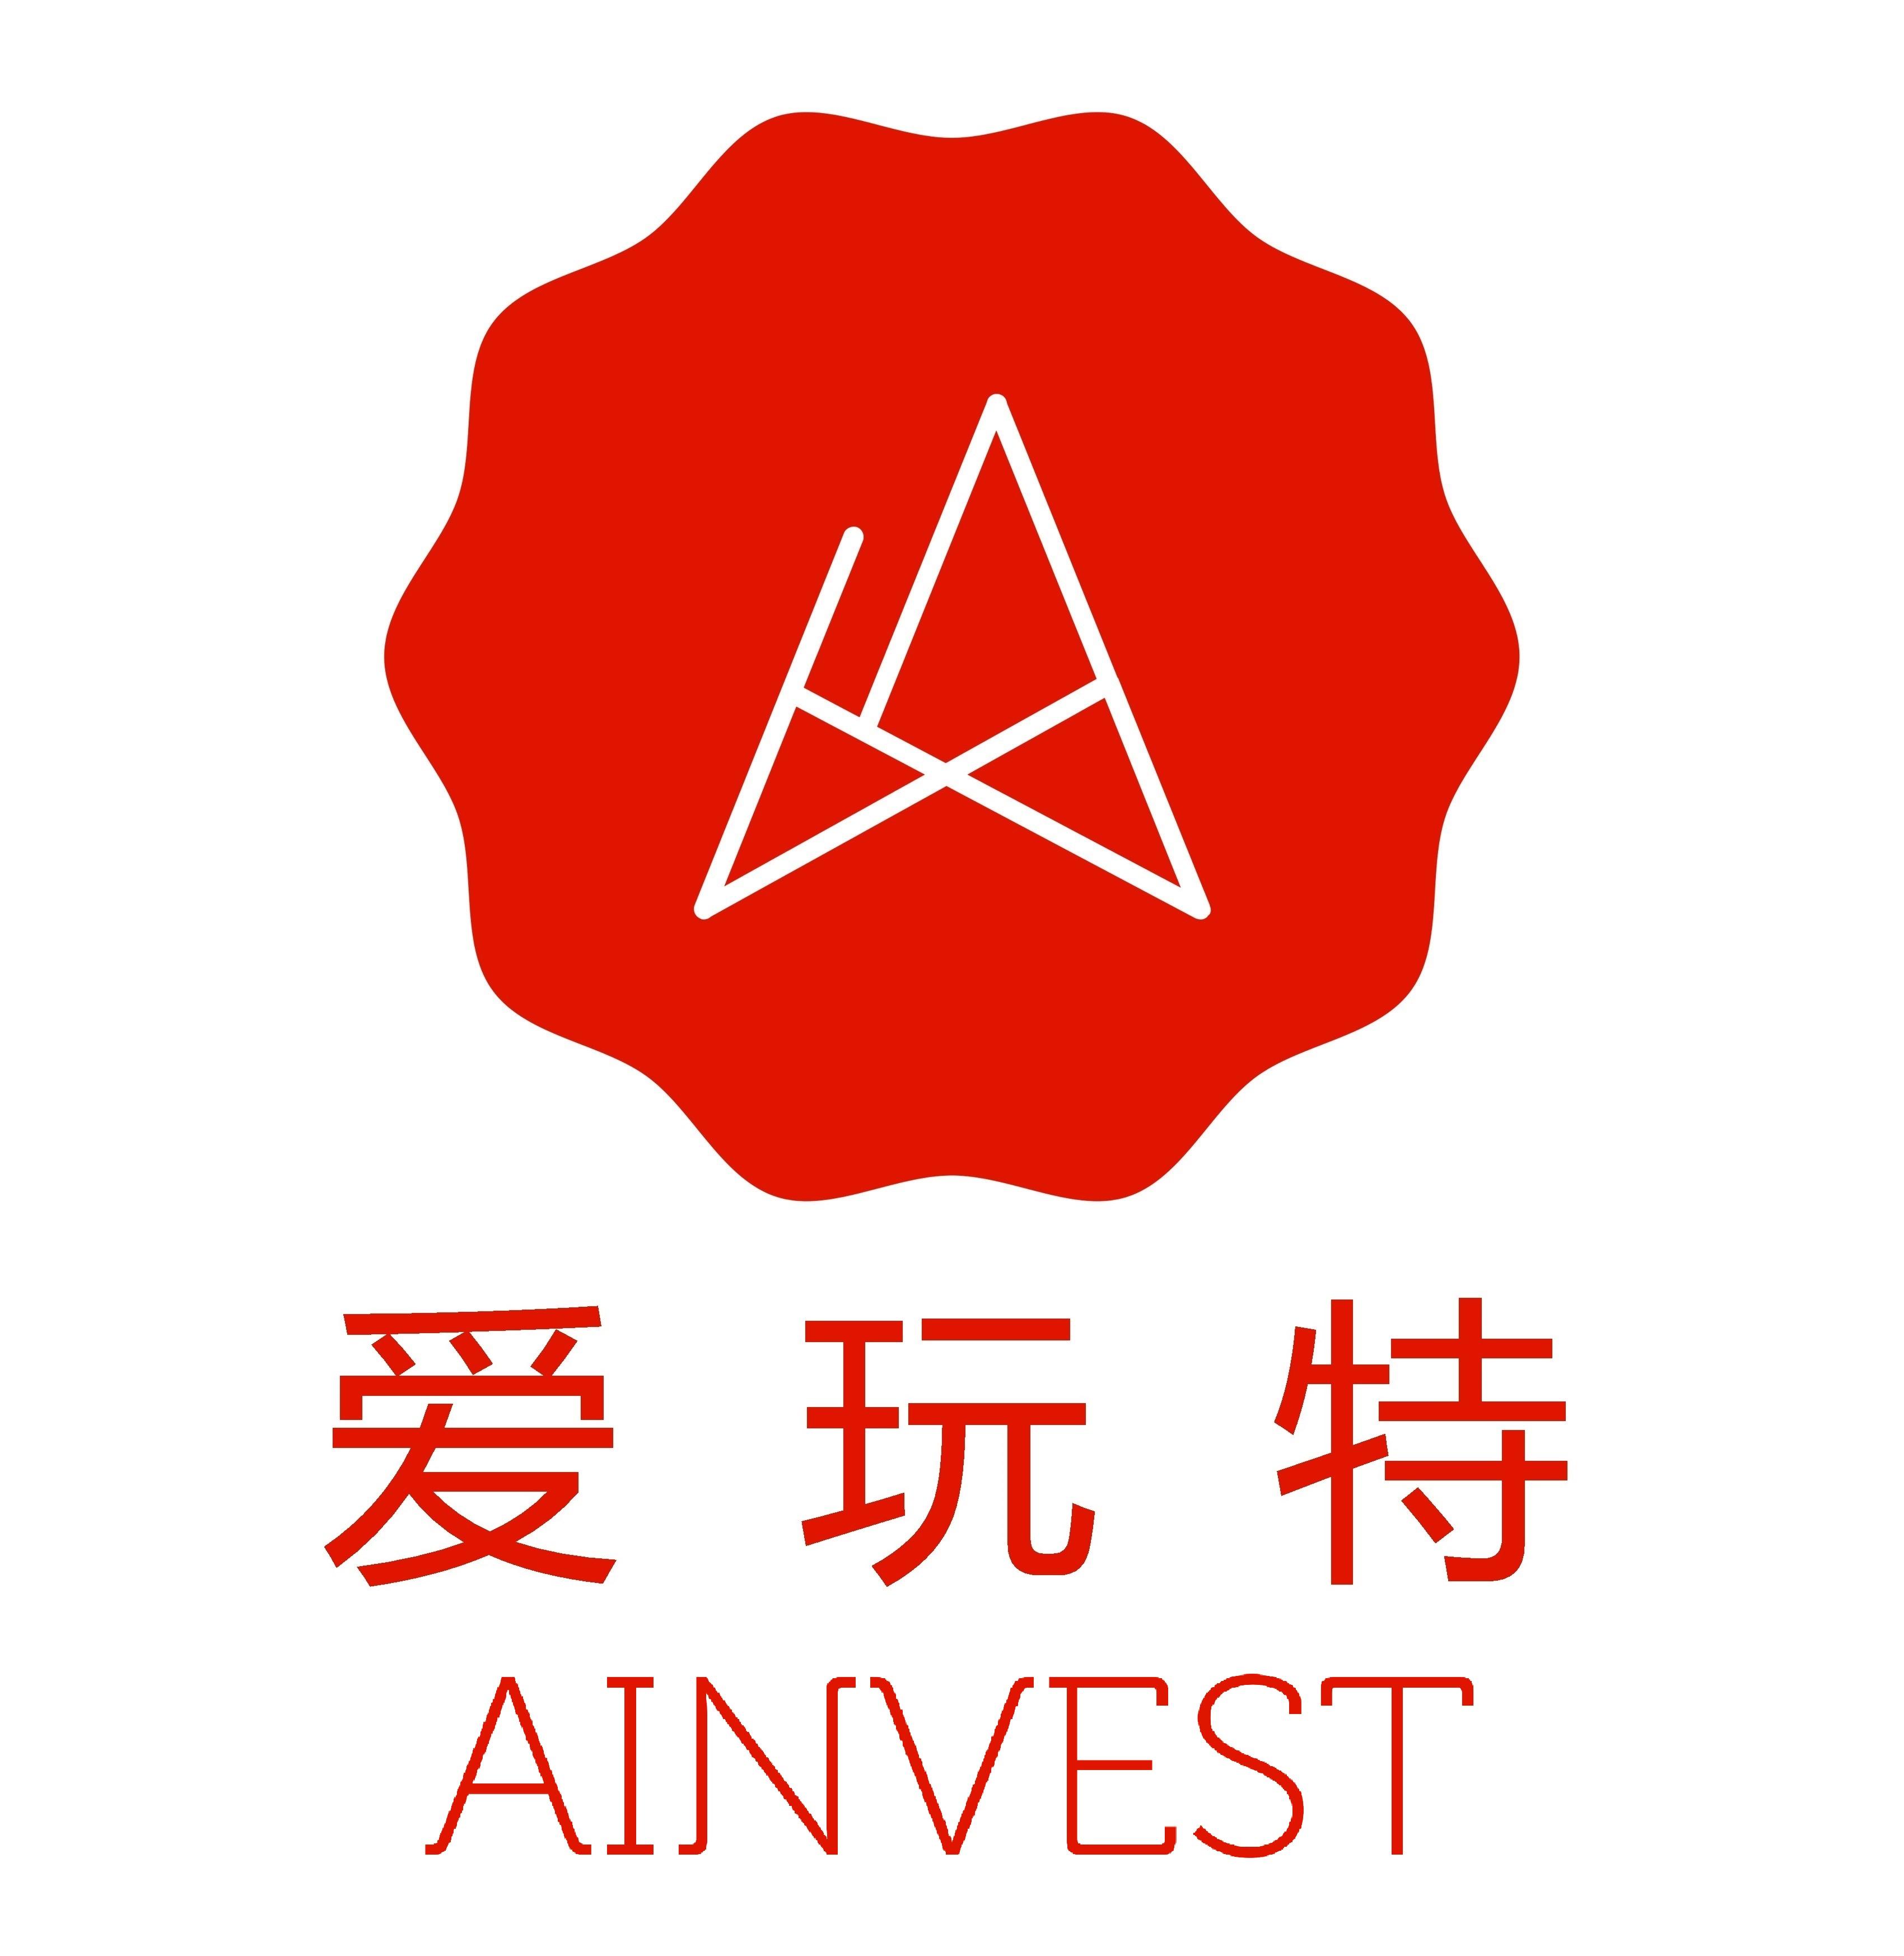 爱玩特AInvest